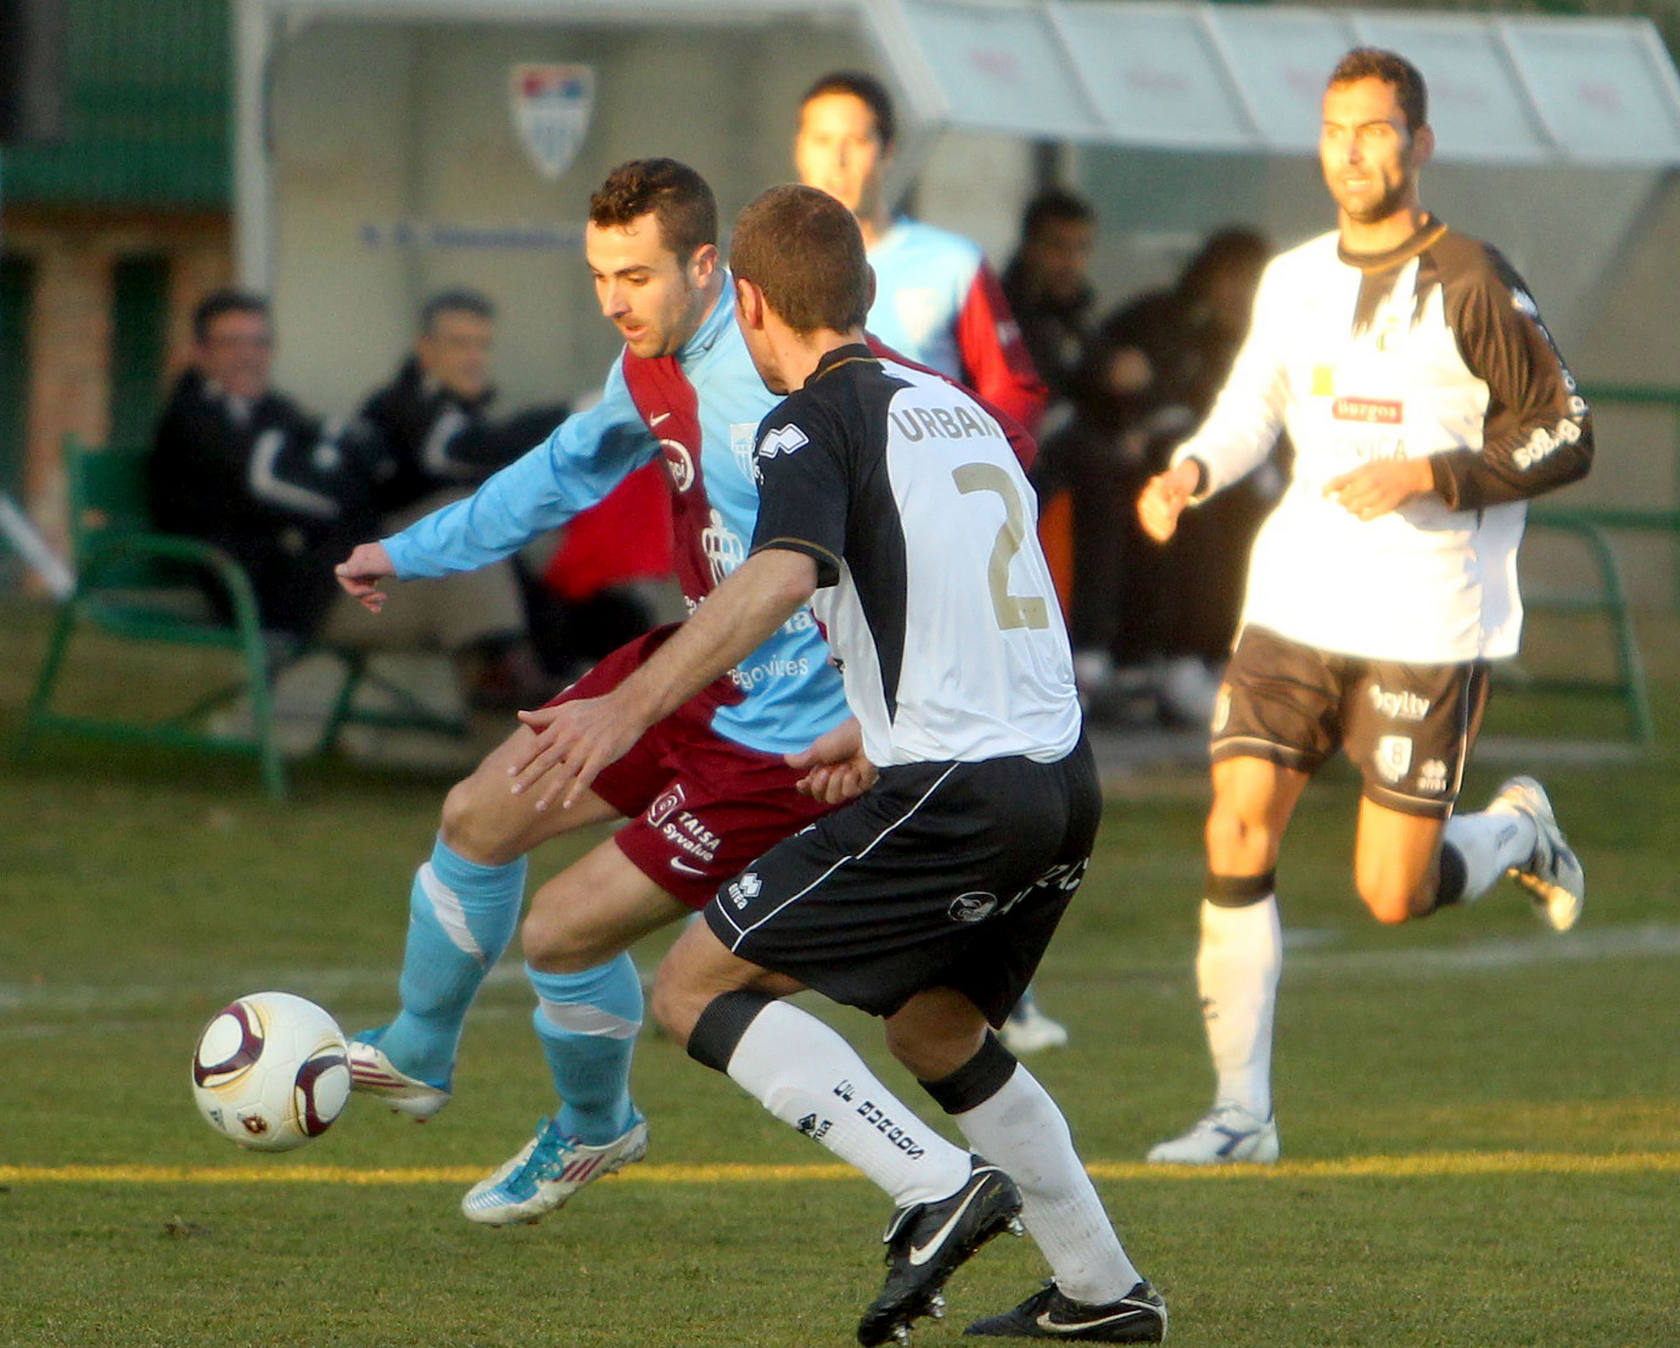 Gimnástica Segoviana CF 0 - 1 Burgos CF